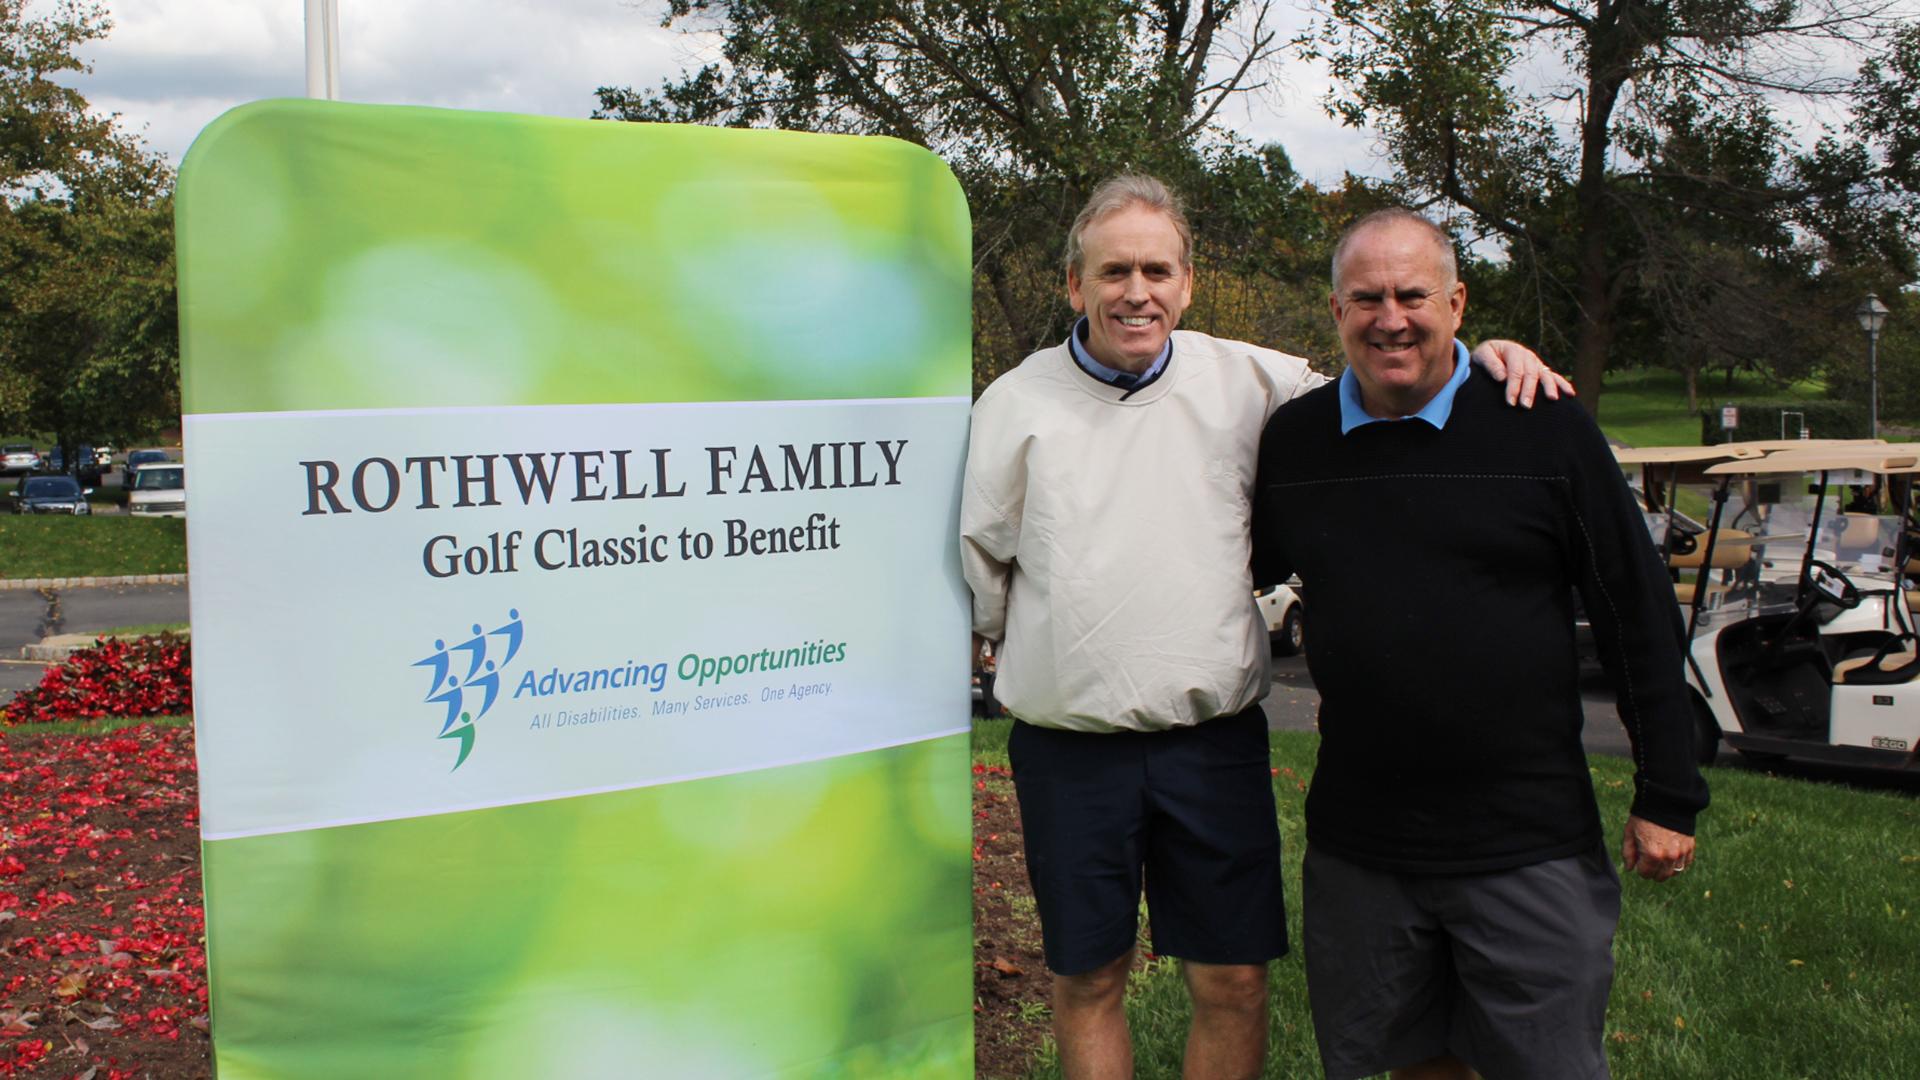 Rothwell Family Golf Classic